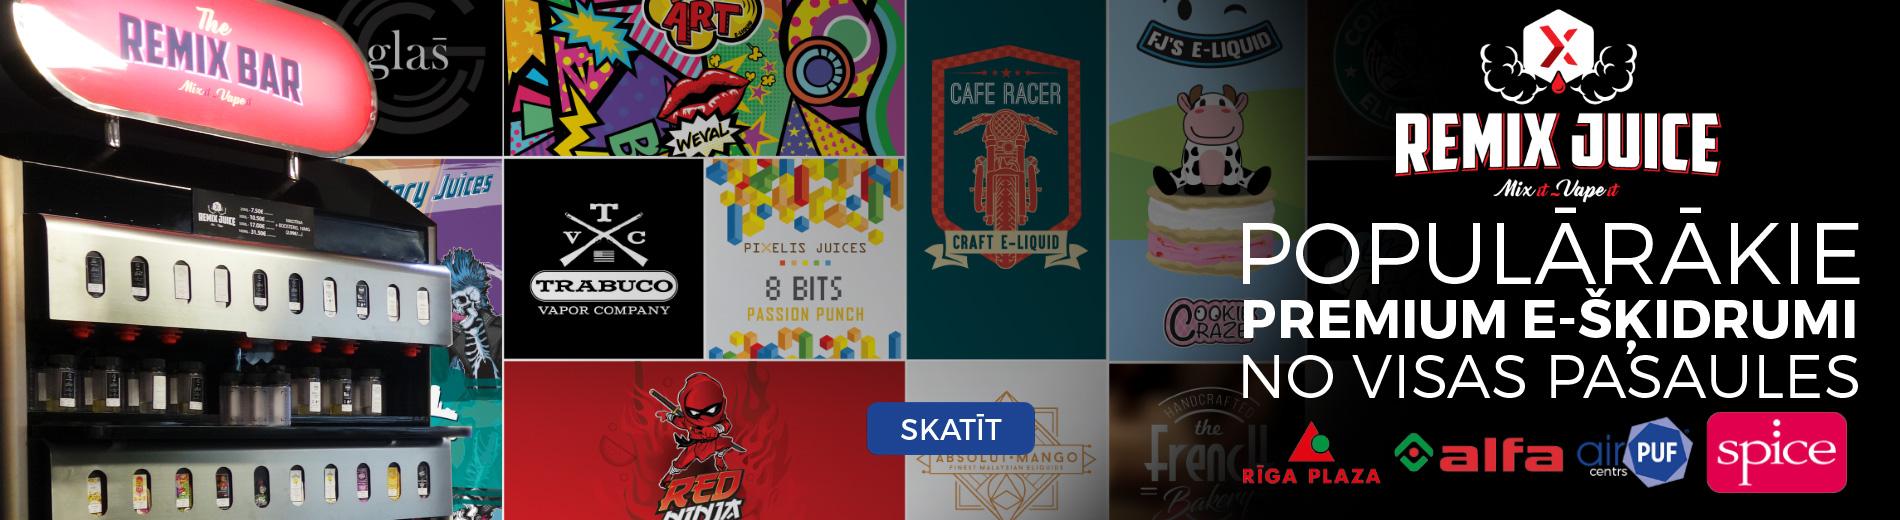 remix juice, remix bar, e-šķidruma bārs, e-cigaretes bārs, airpuf